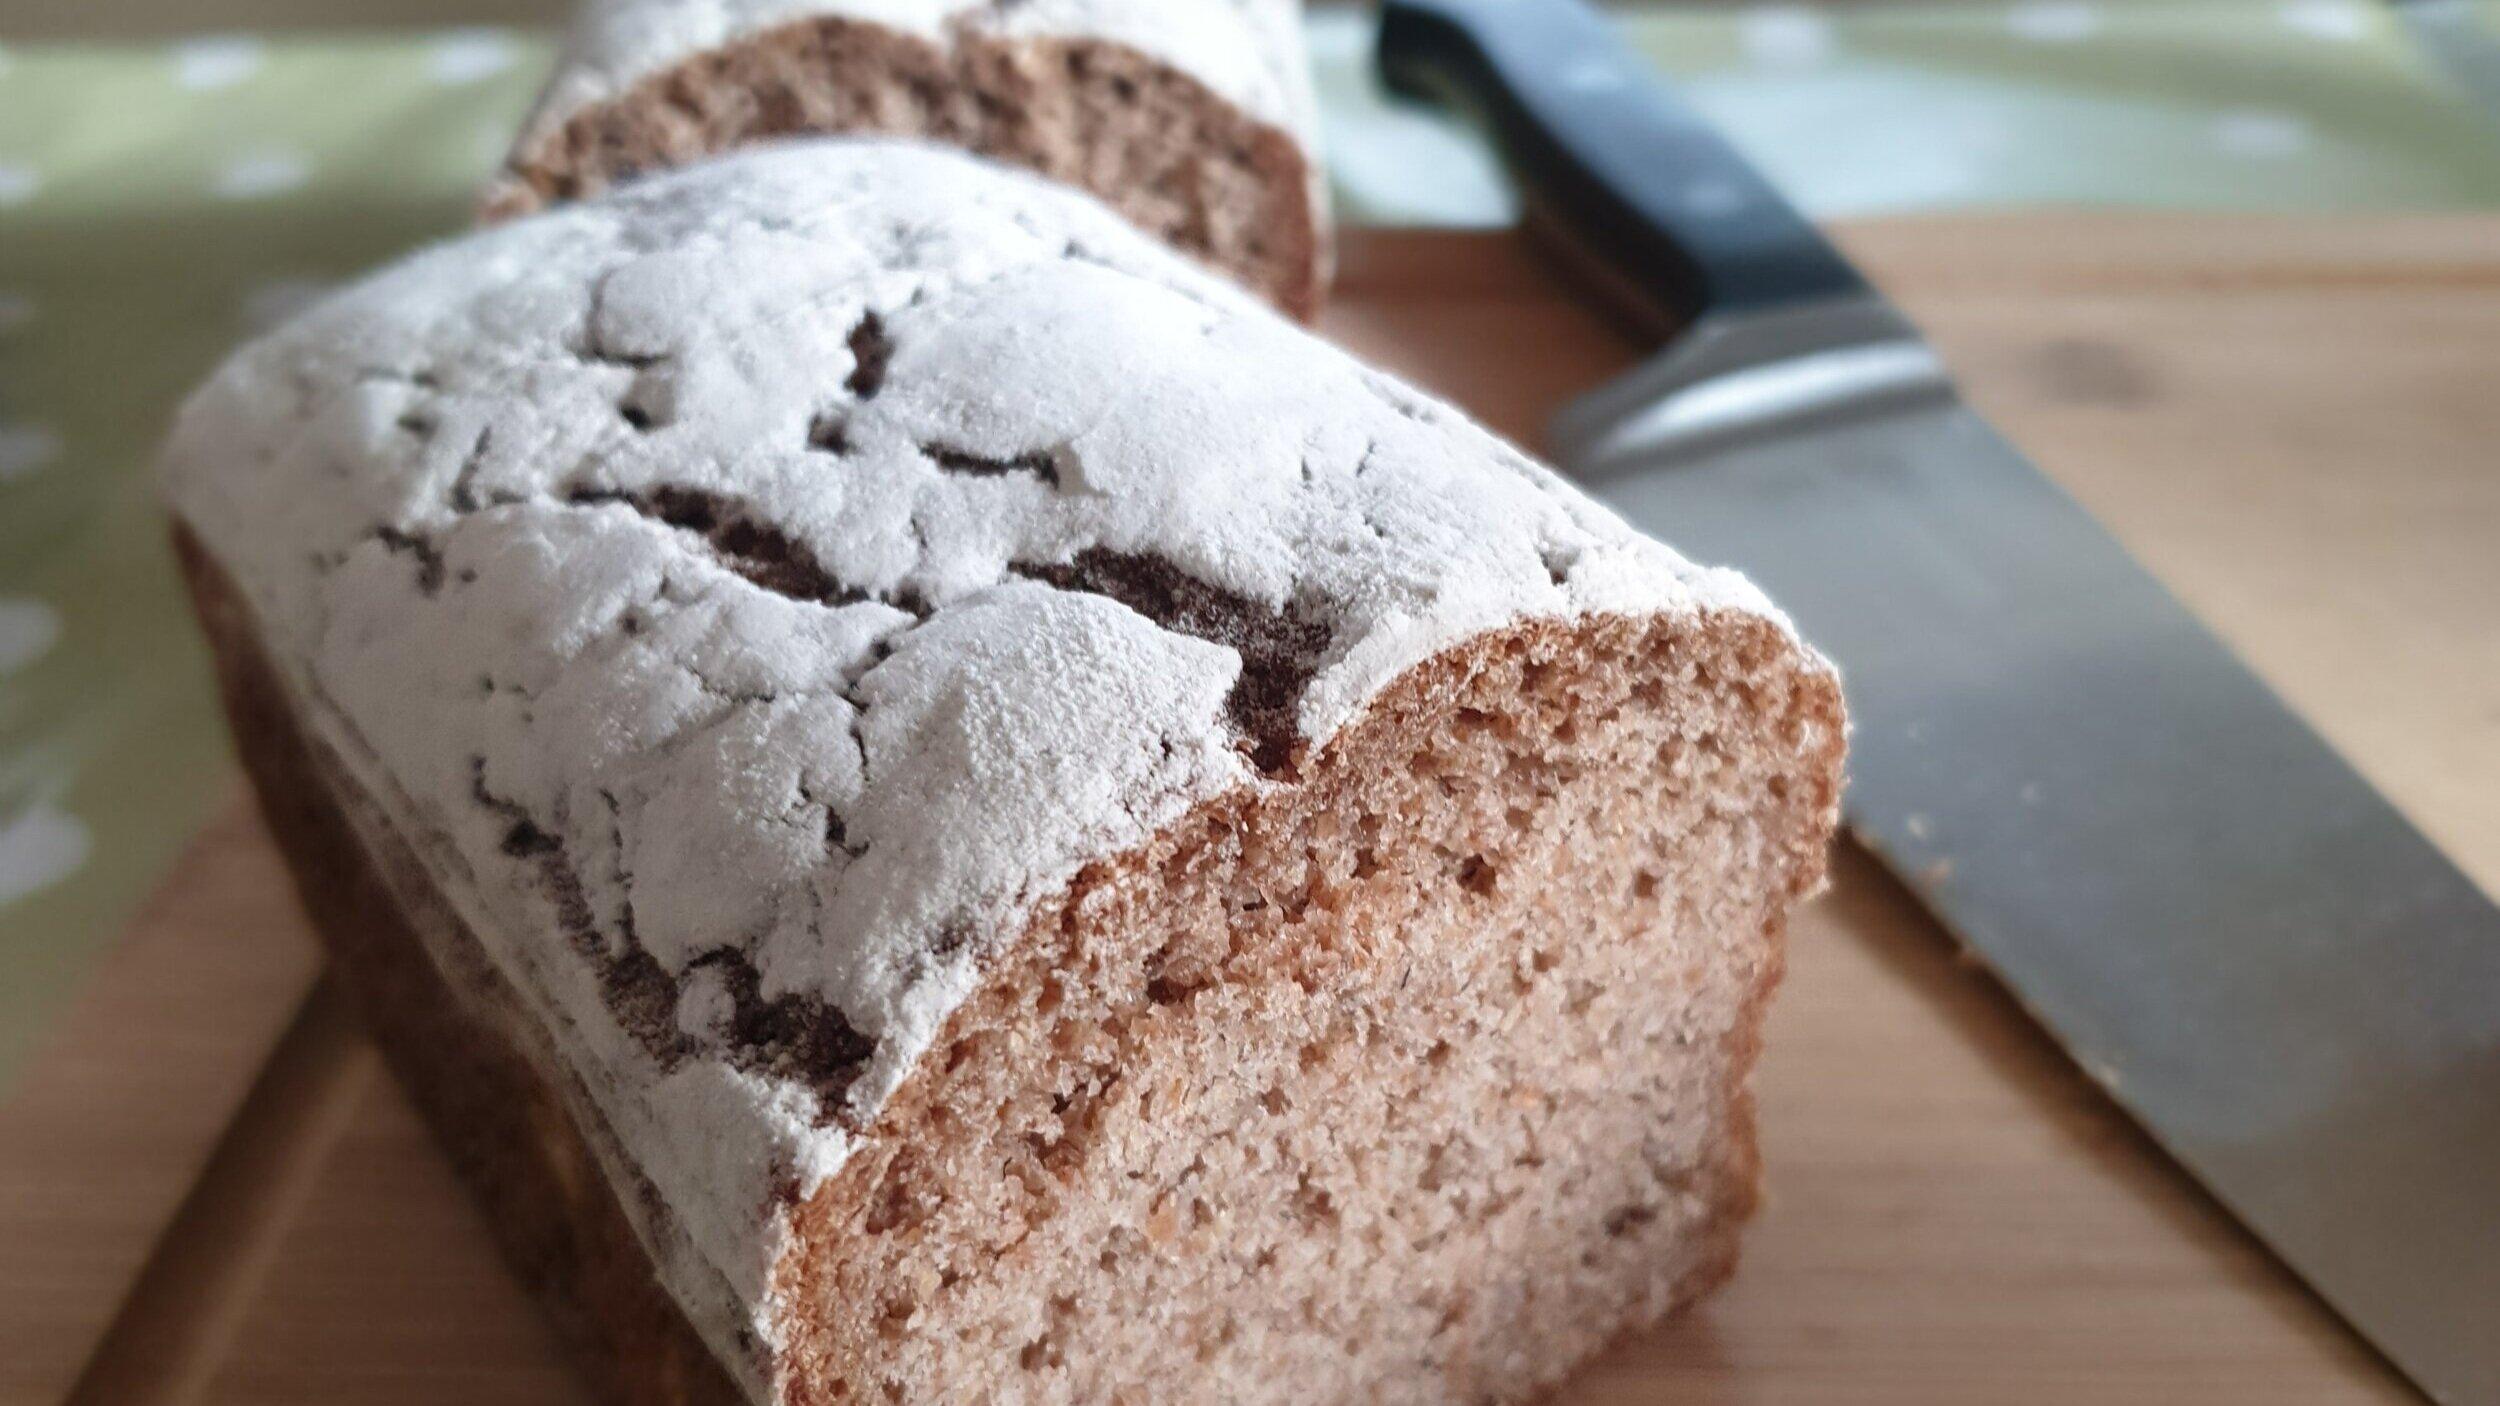 Steve%27s+Sourdough+Bread